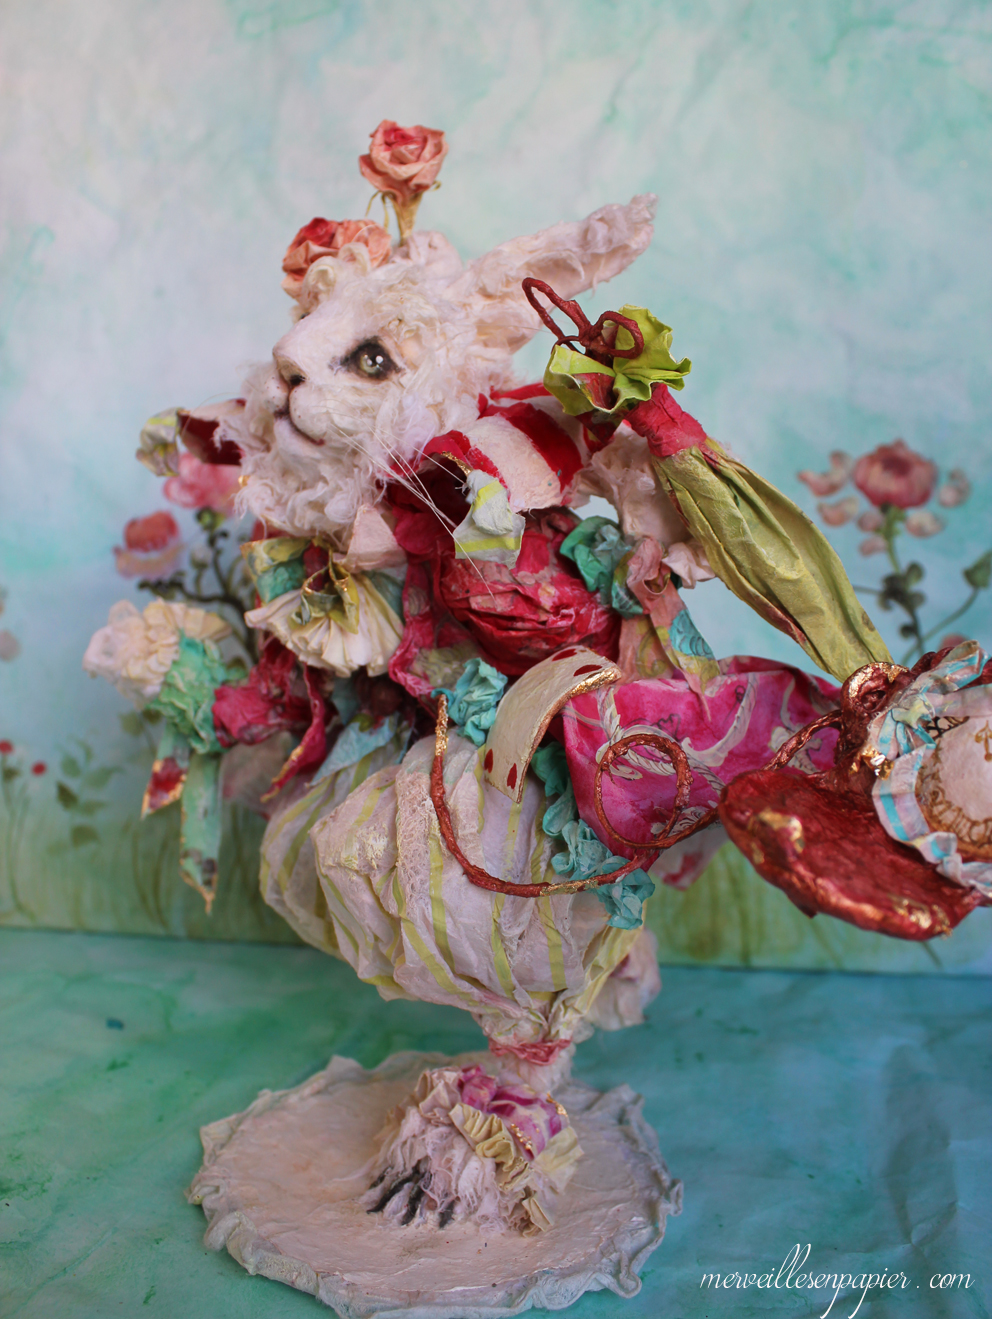 petit-lapin-blanc-8.jpg